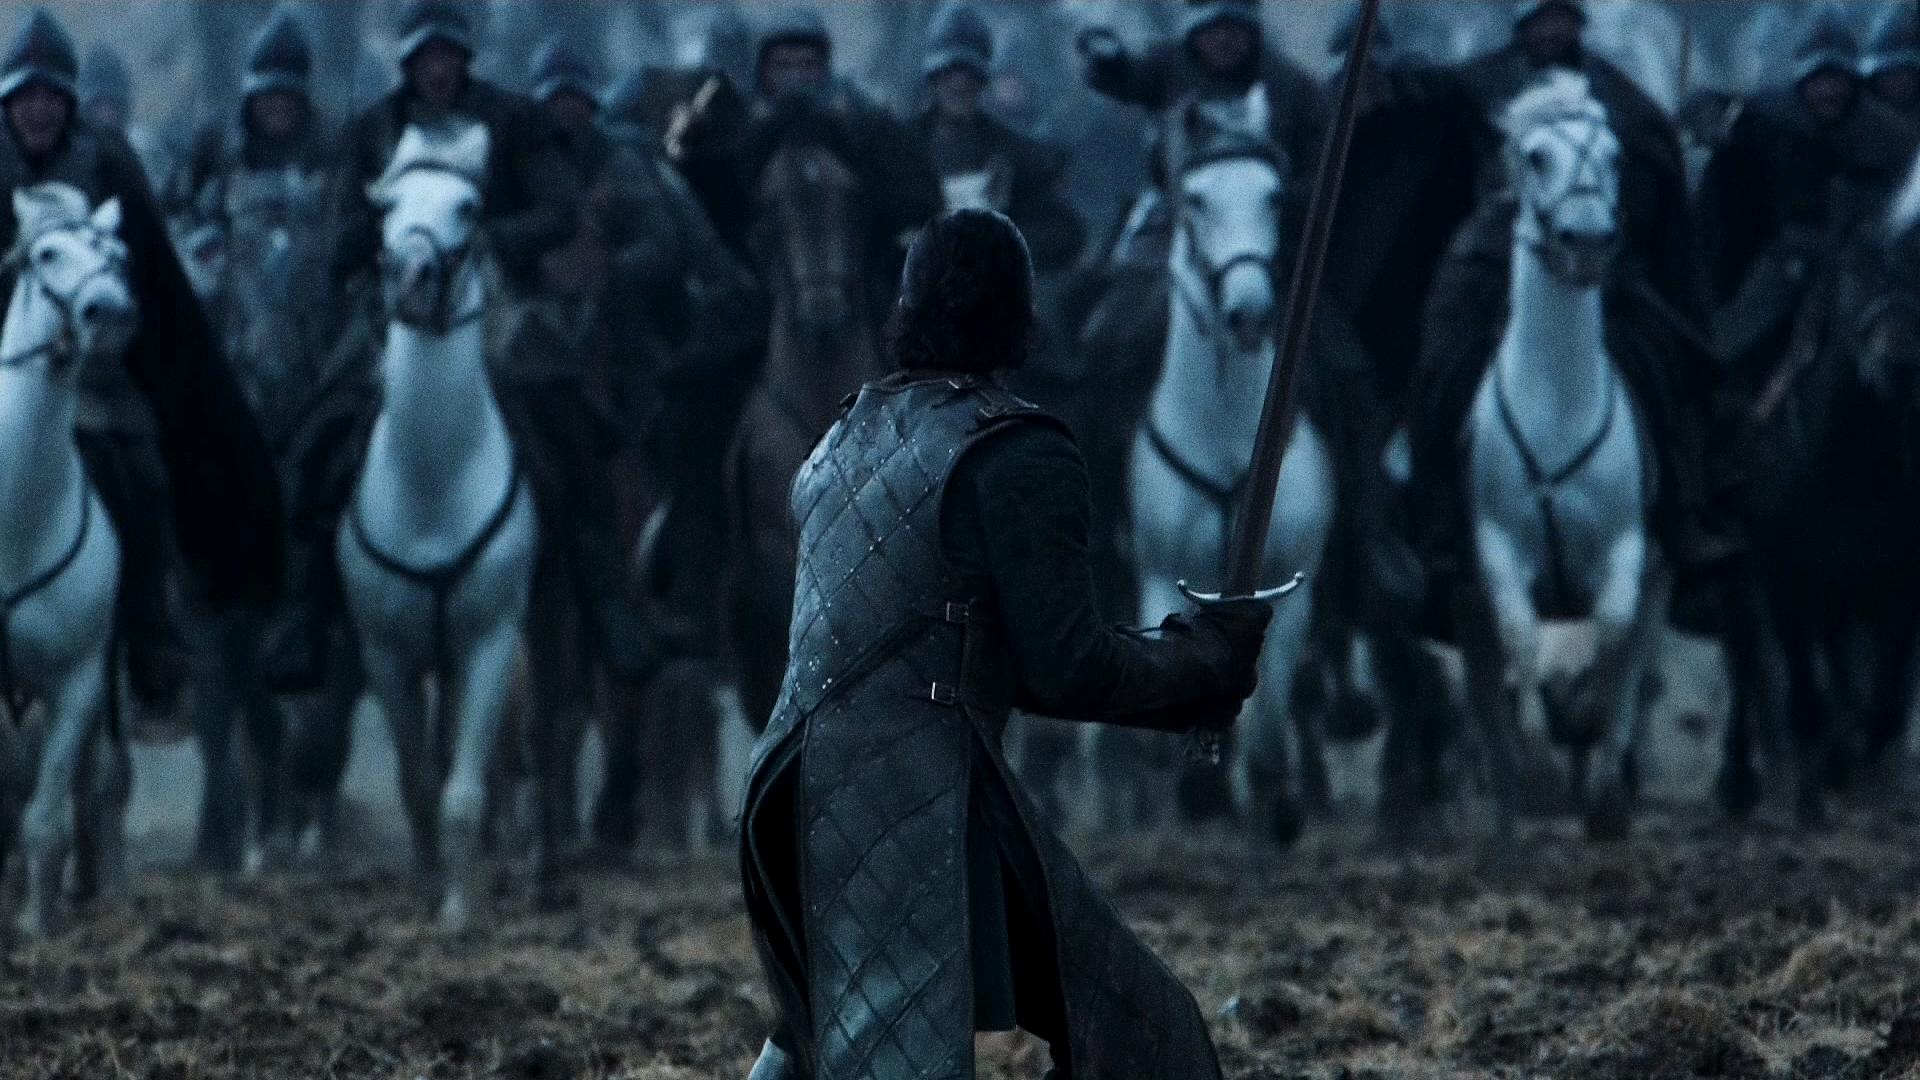 Free Download Best Jon Snow Game Of Thrones Wallpaper 2017 61930